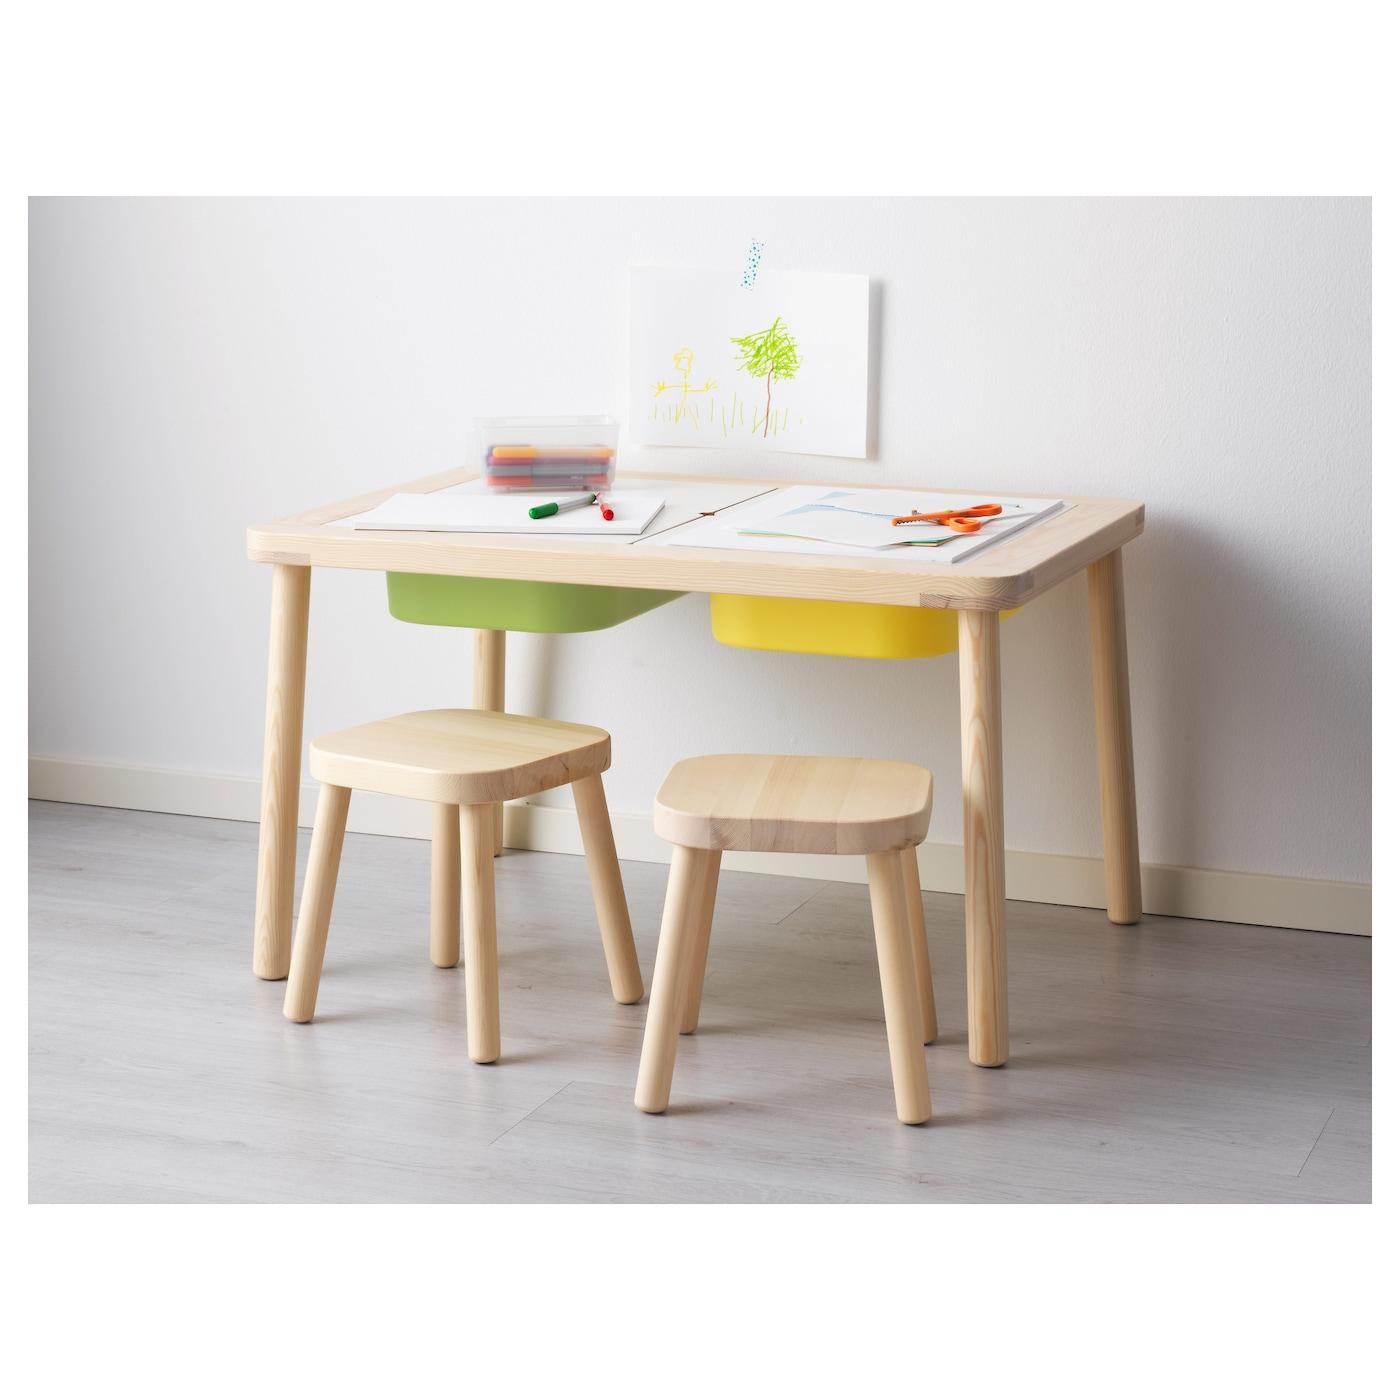 Flisat children 39 s table 83x58 cm ikea for Ikea drawing desk